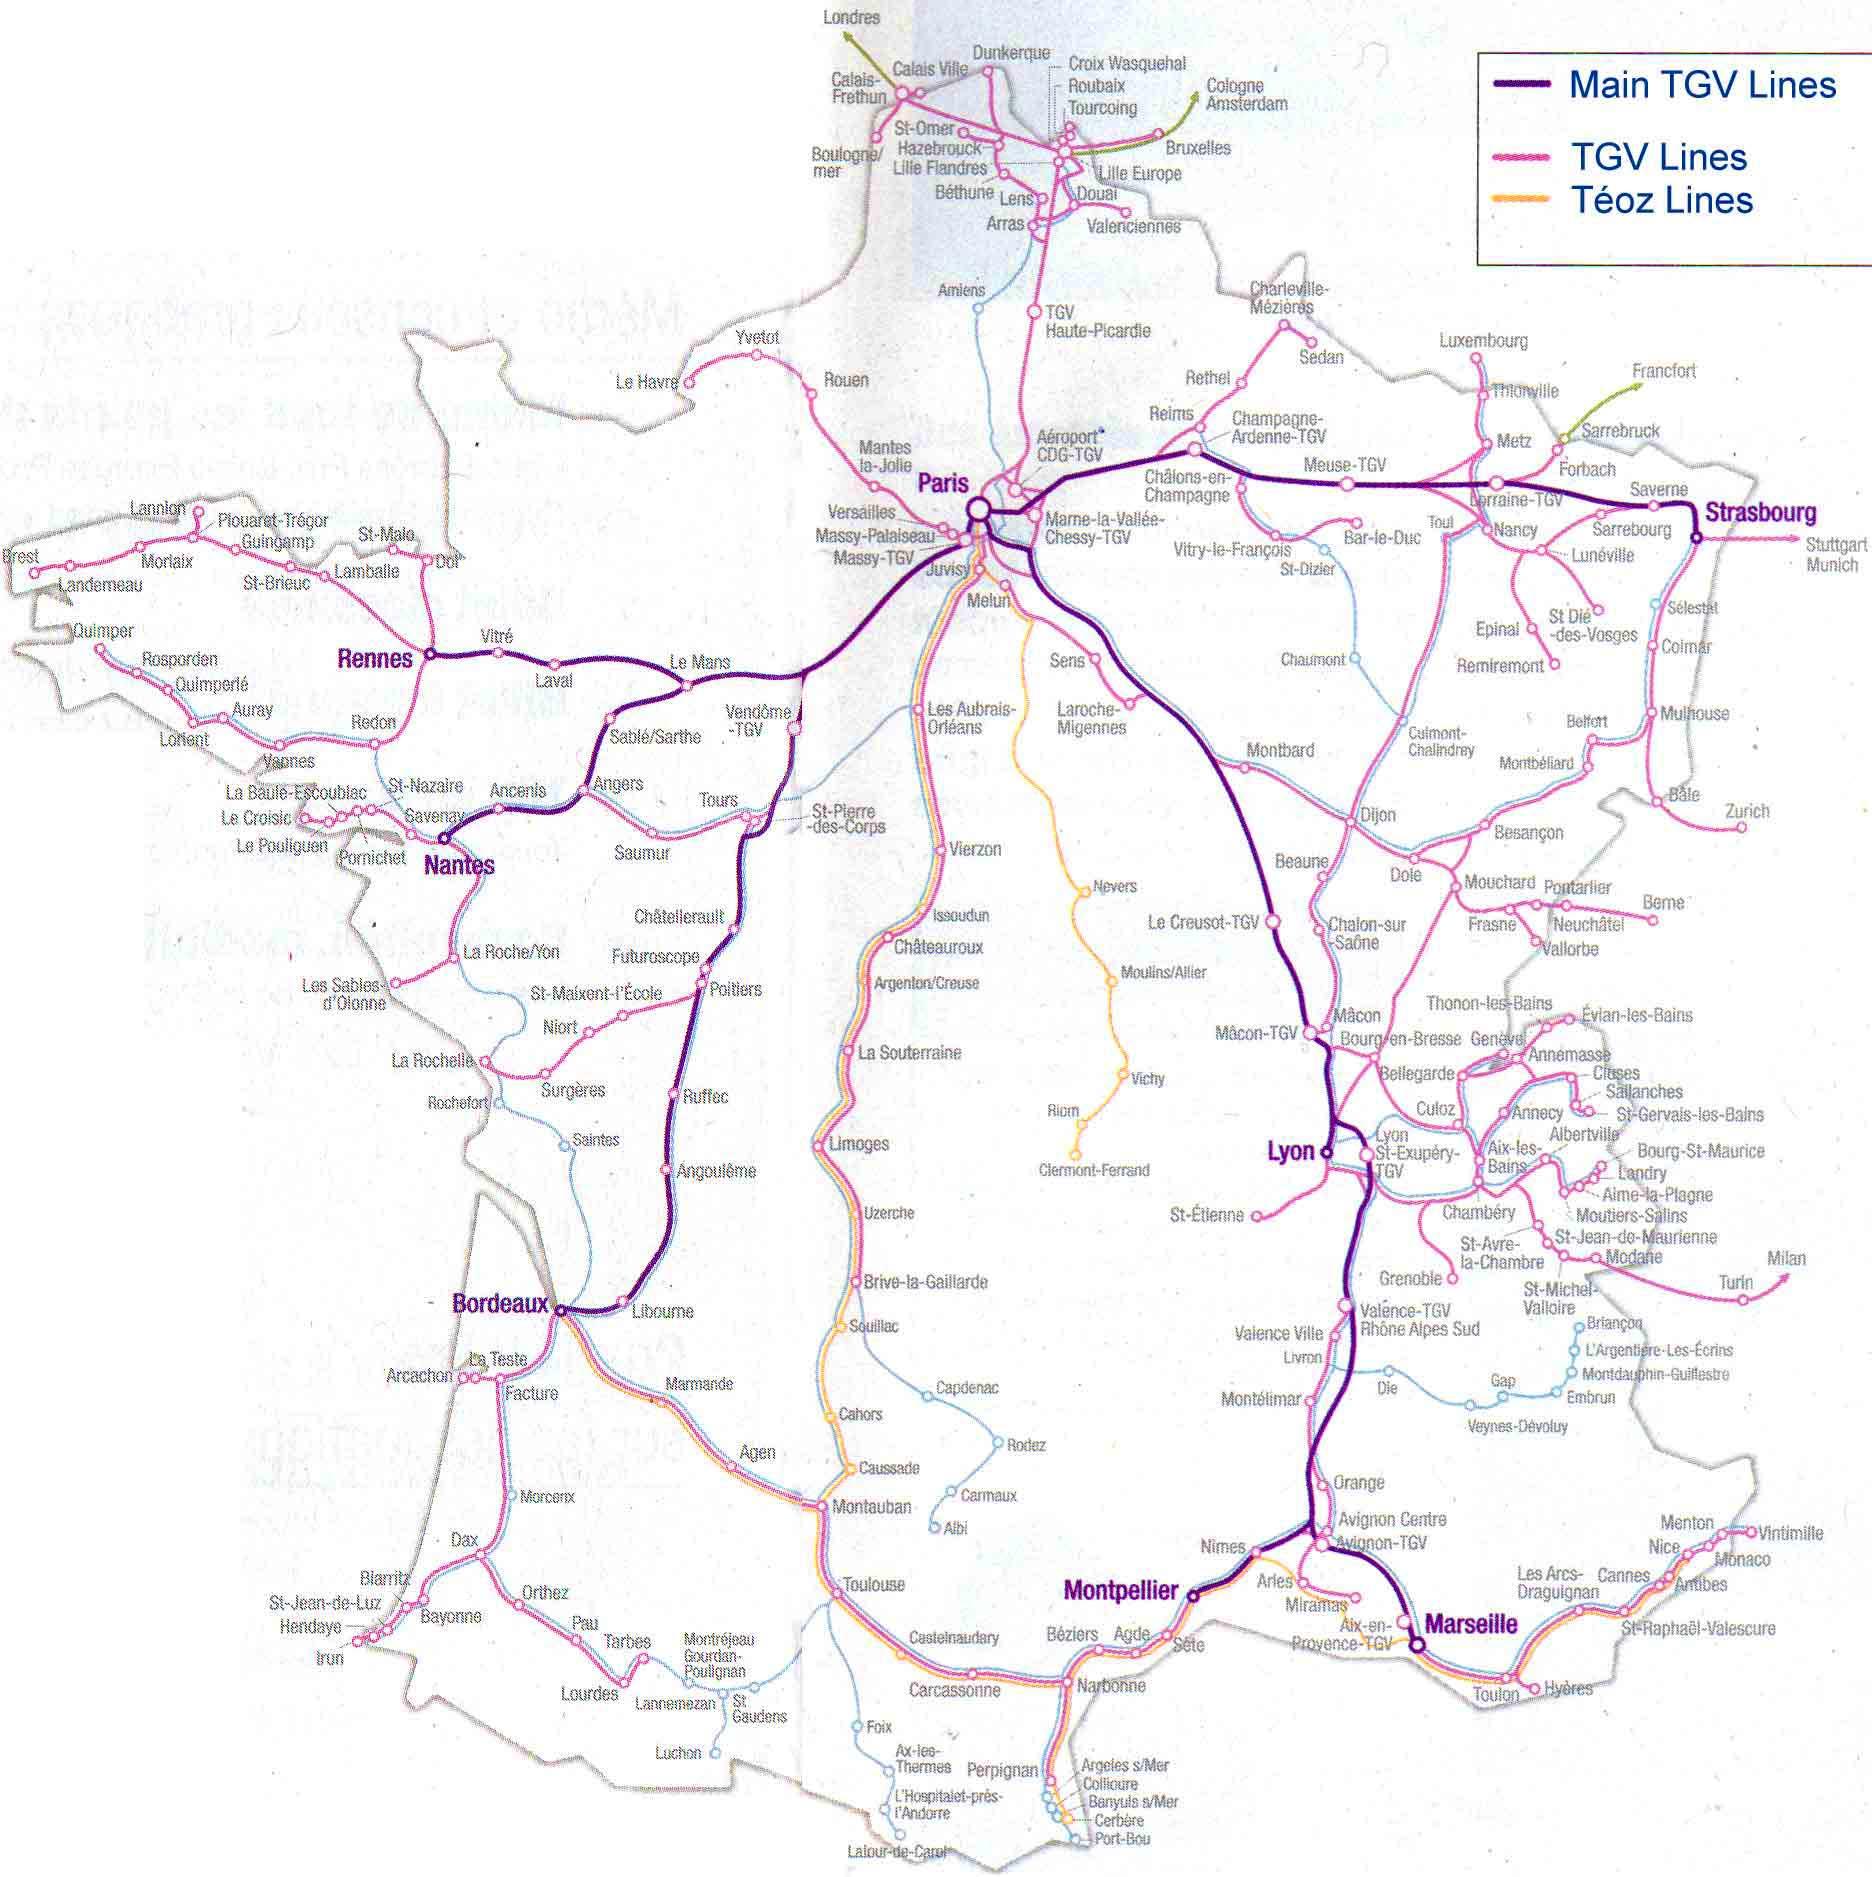 tgv_map.jpg